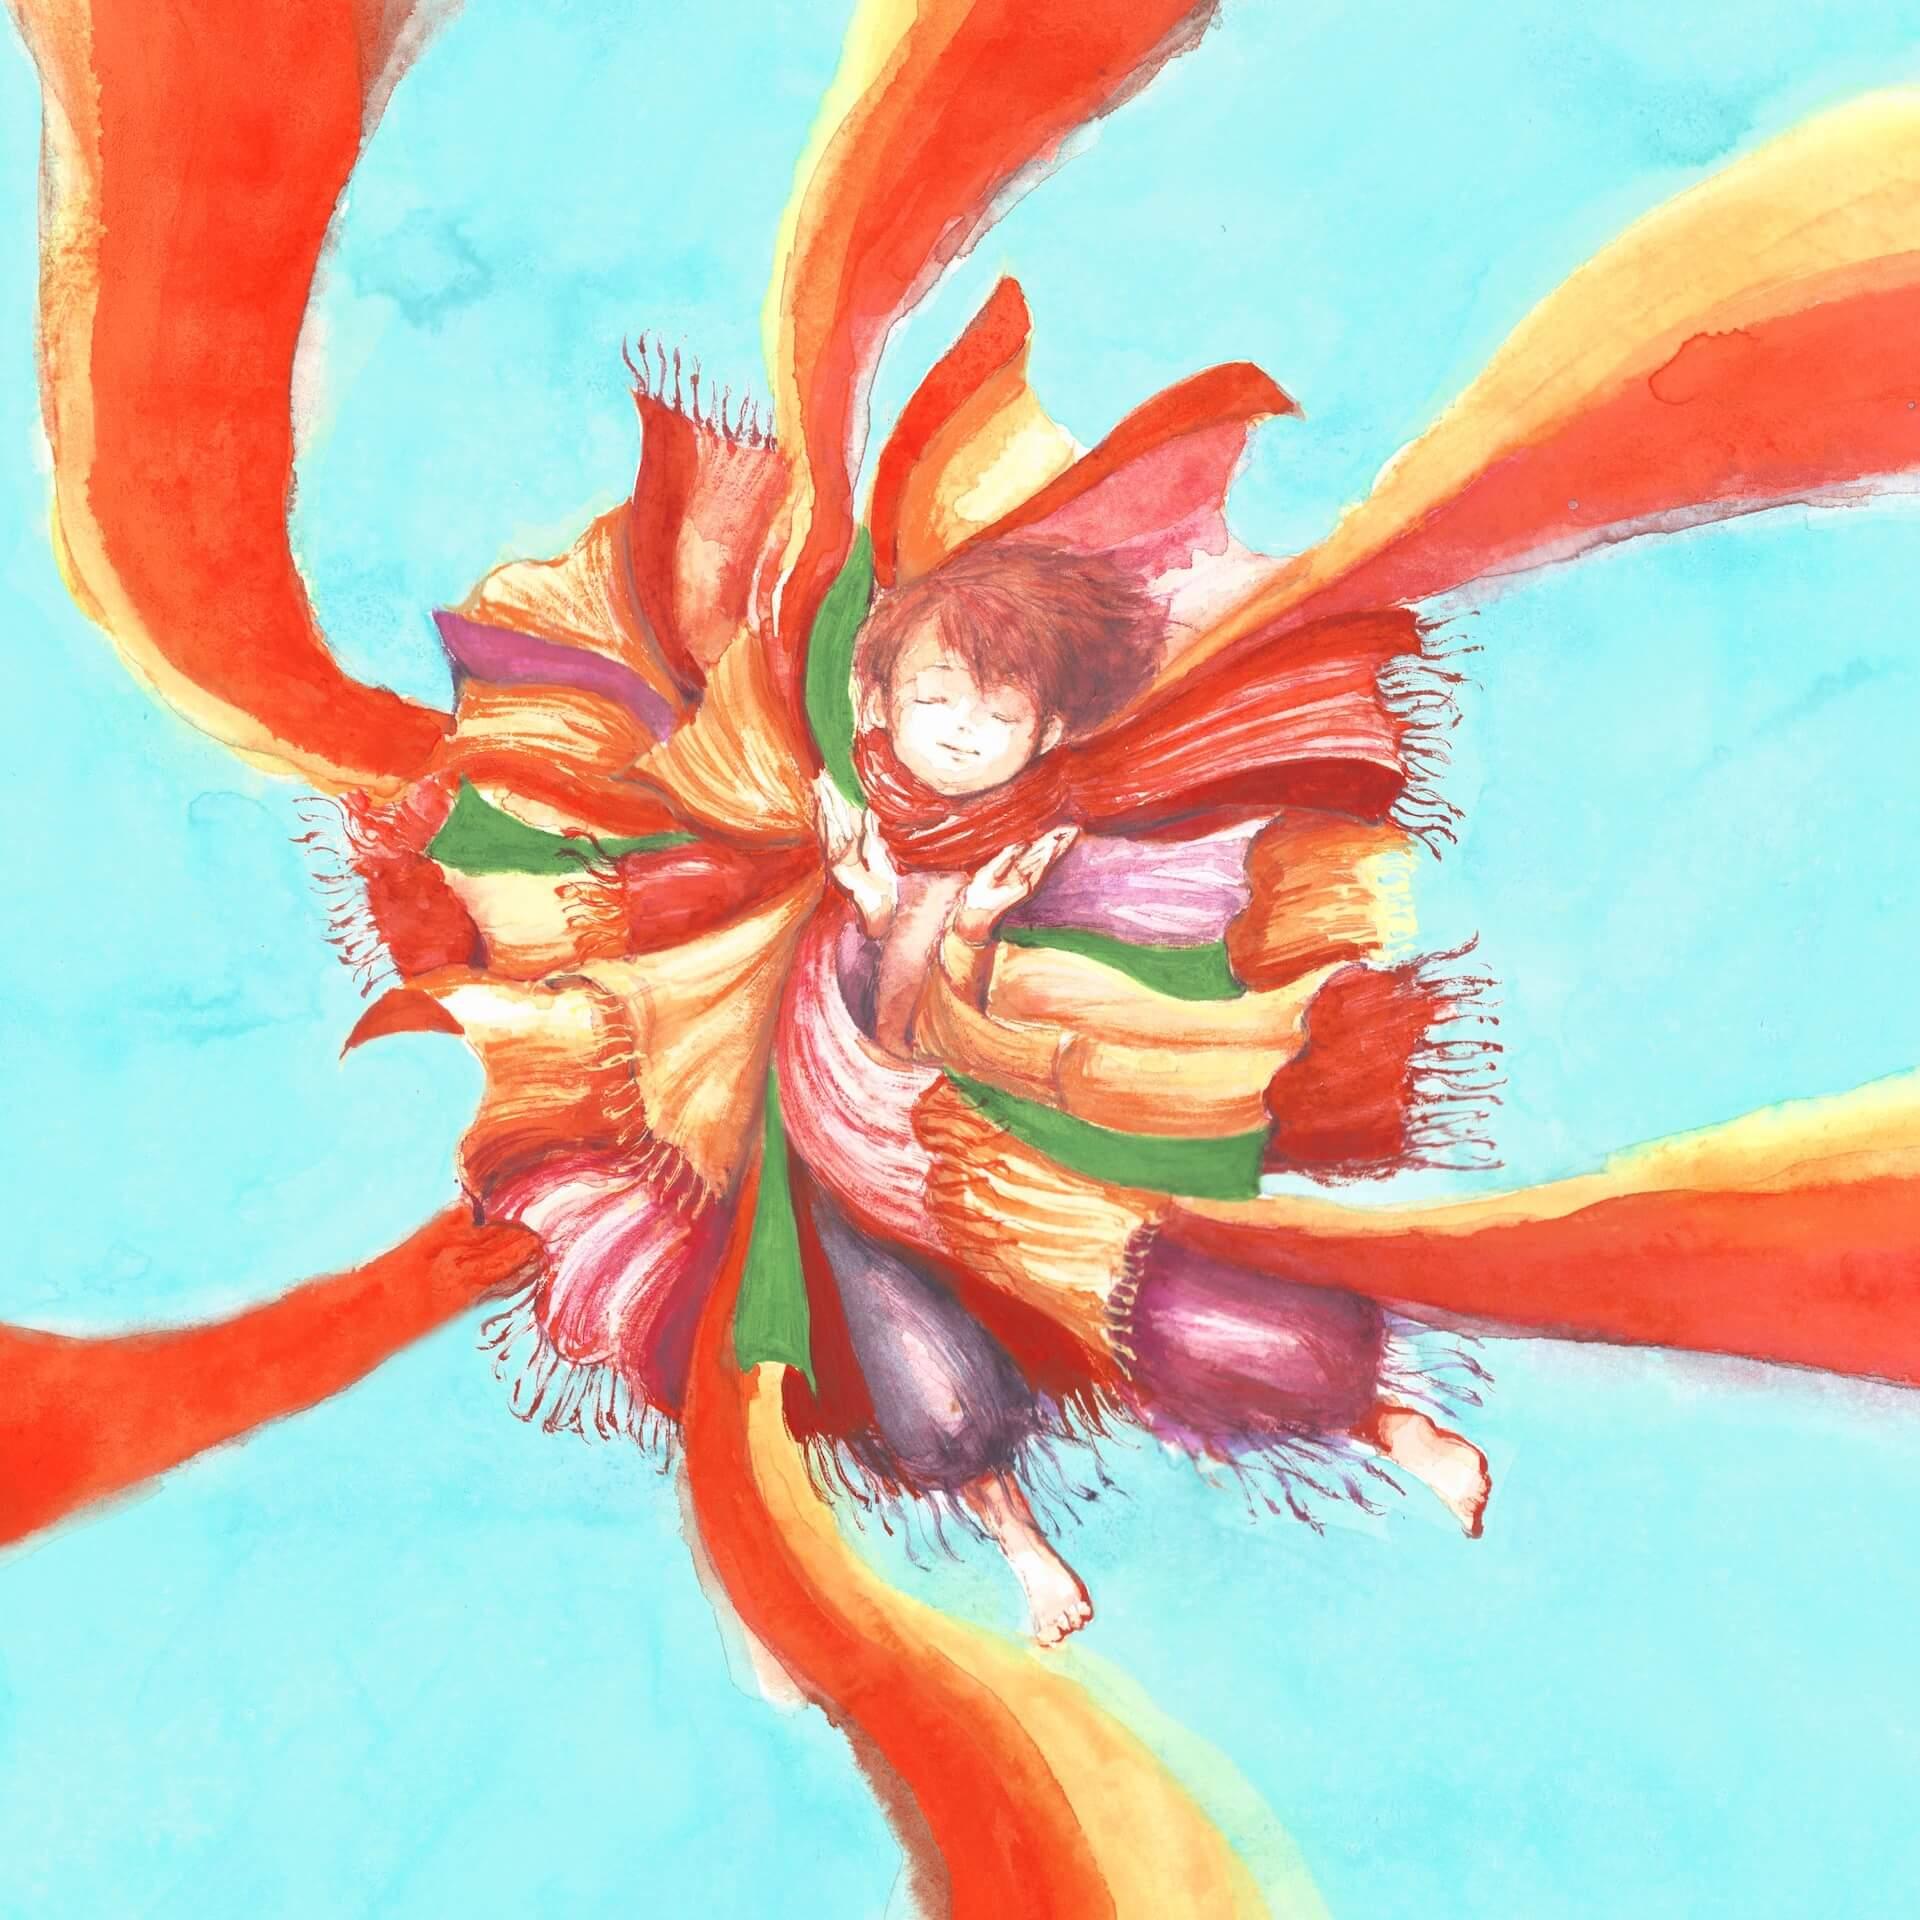 Foorin team E『Paprika』のシングルパッケージが初公開!初回盤にはポスター型、英語の歌詞カード付き music200116_paprika_1